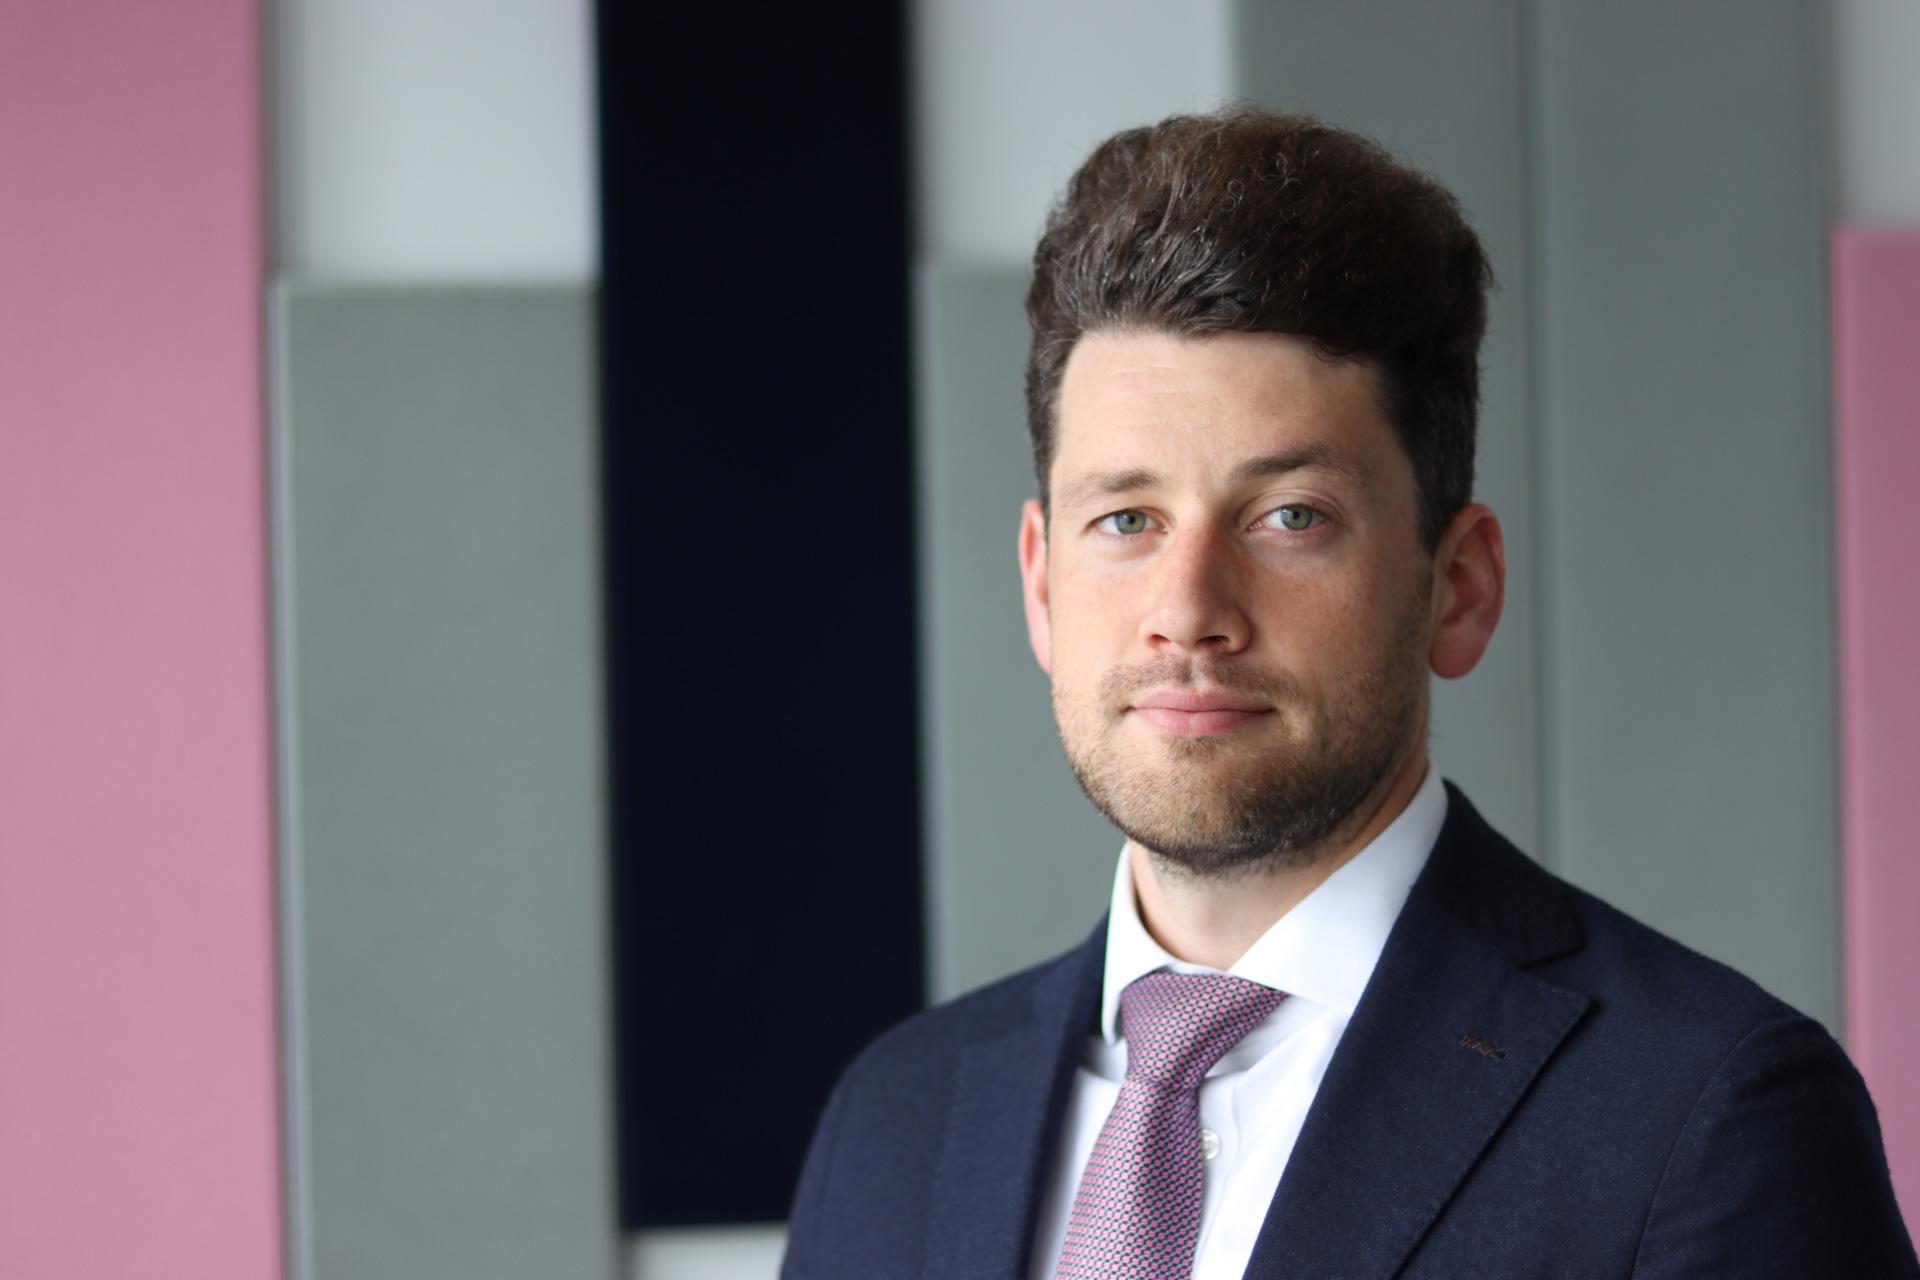 David Keogh FCCA, partner at Keogh Accountancy Galway